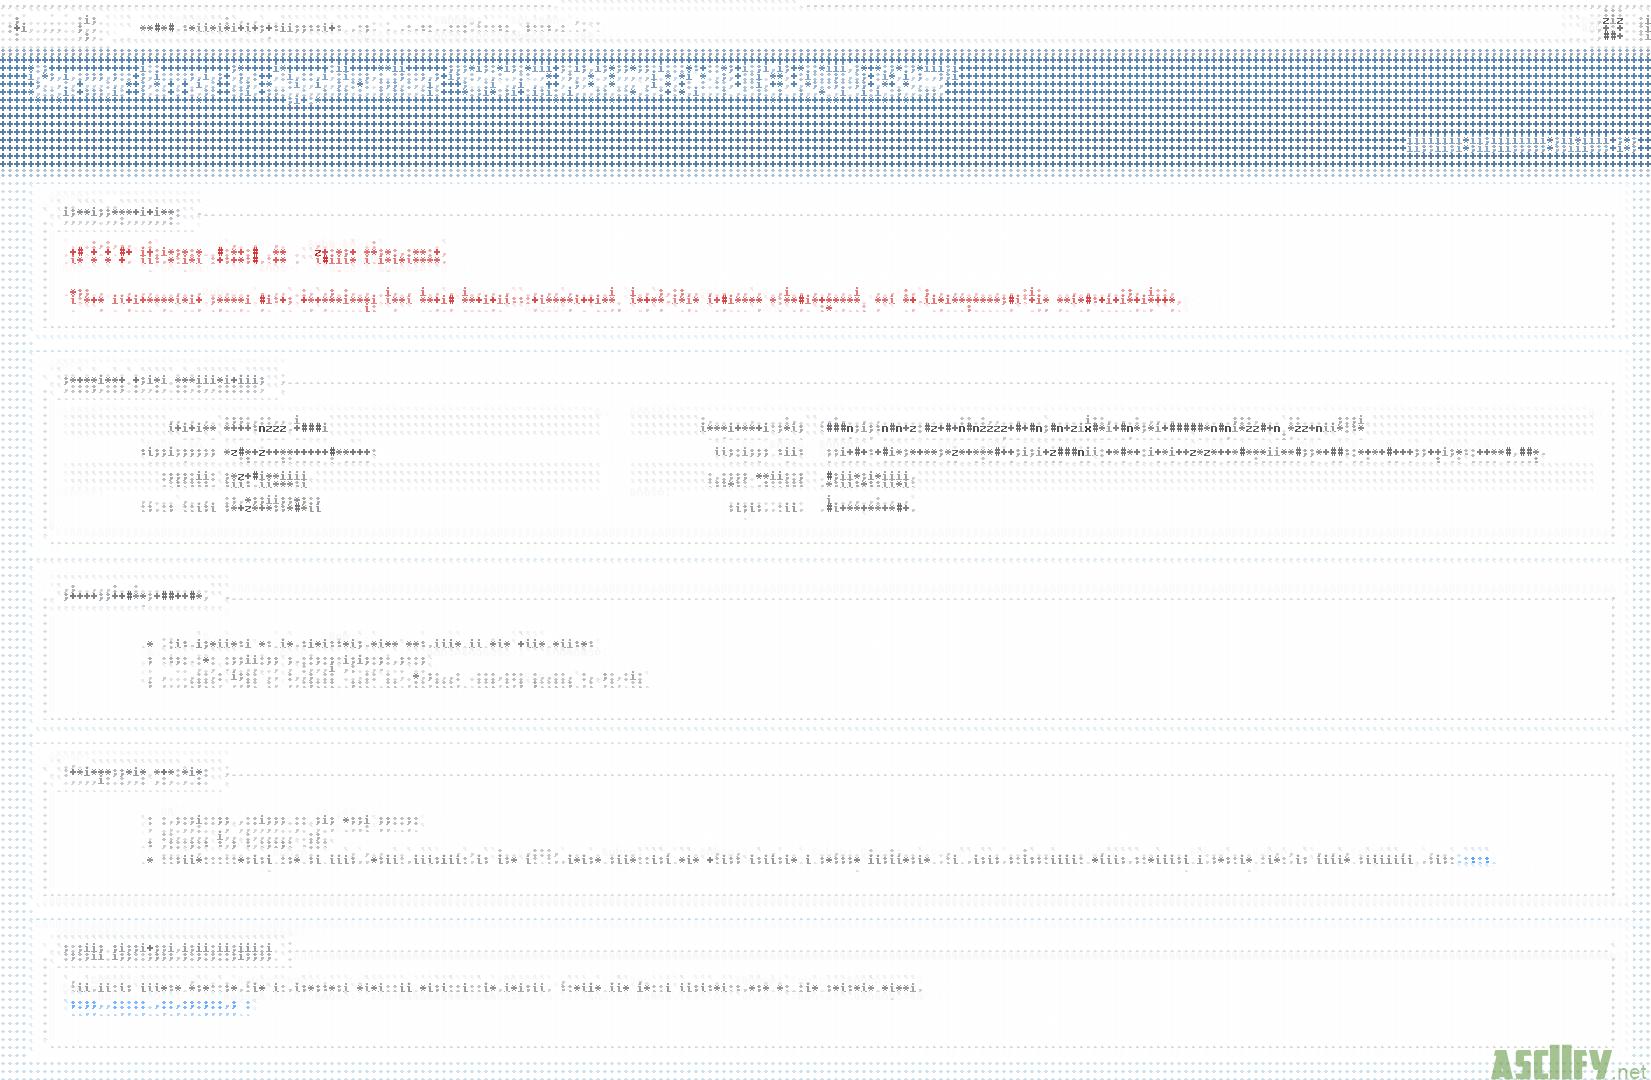 Server error in application roundtablecloud.com